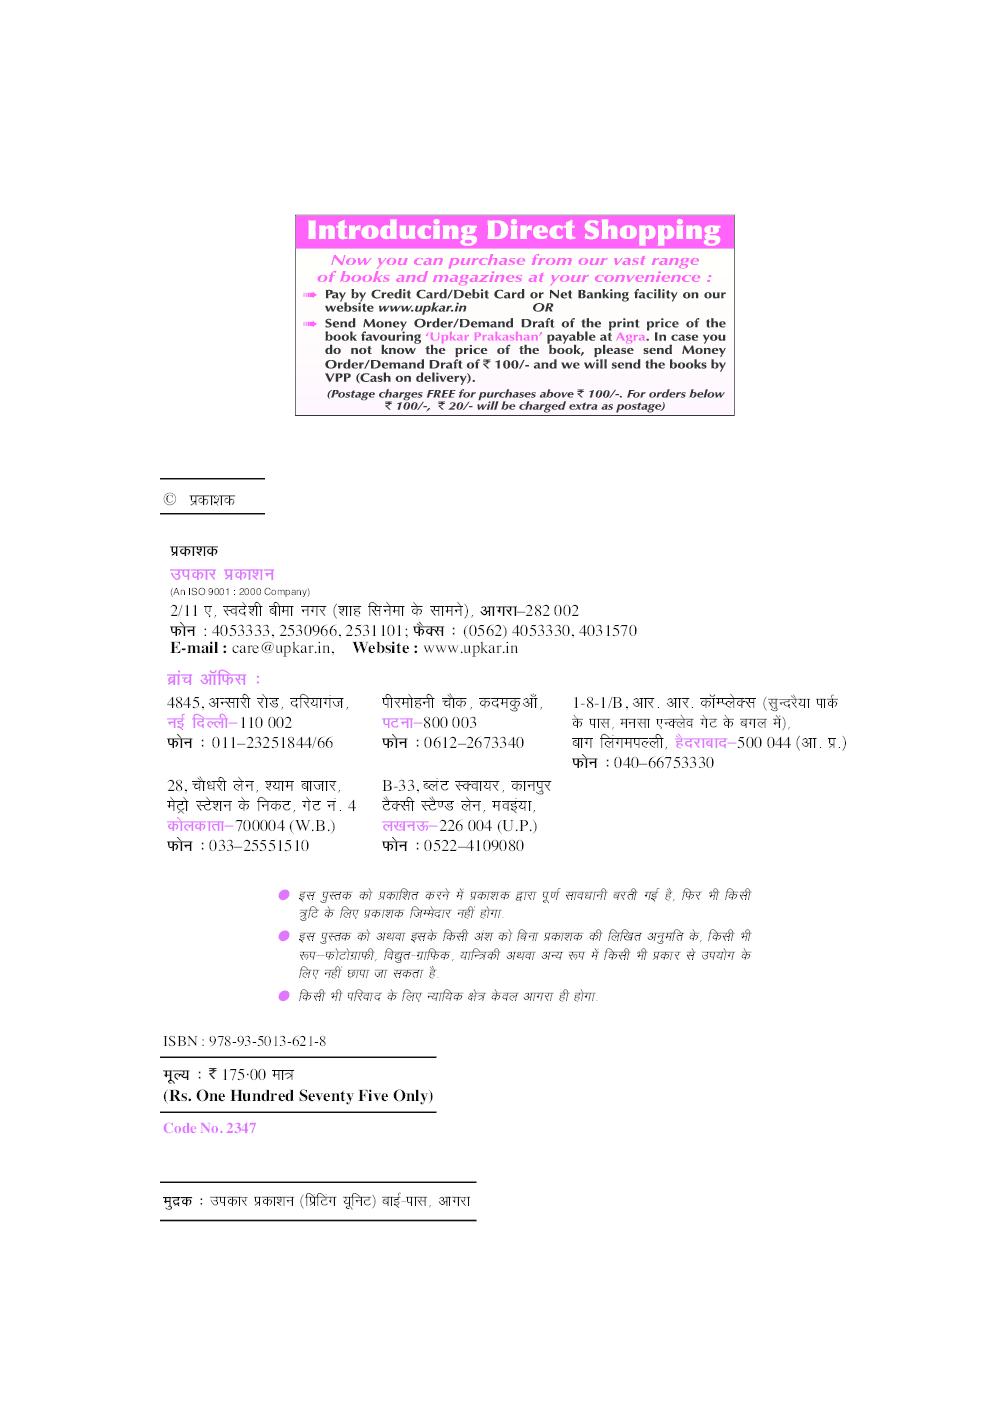 मध्य प्रदेश स्टाफ नर्स संयुक्त चयन परीक्षा - Page 3